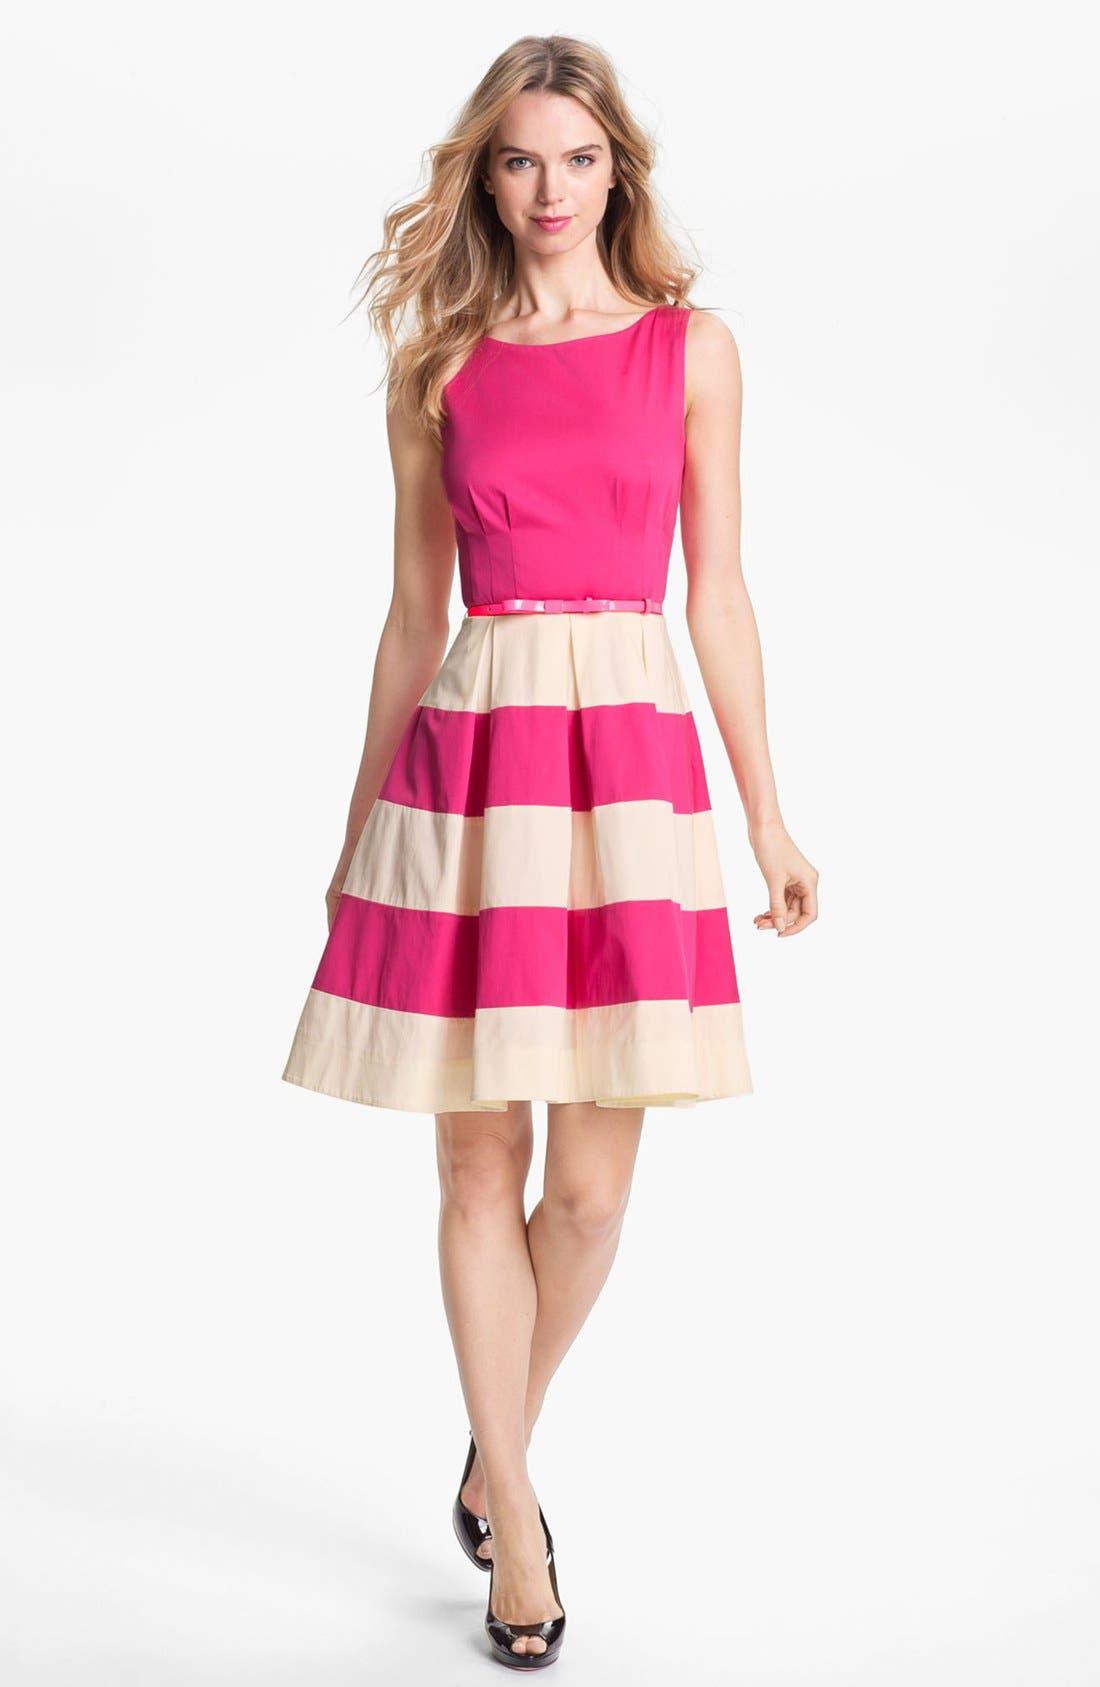 Alternate Image 1 Selected - kate spade new york 'celina' stretch cotton fit & flare dress